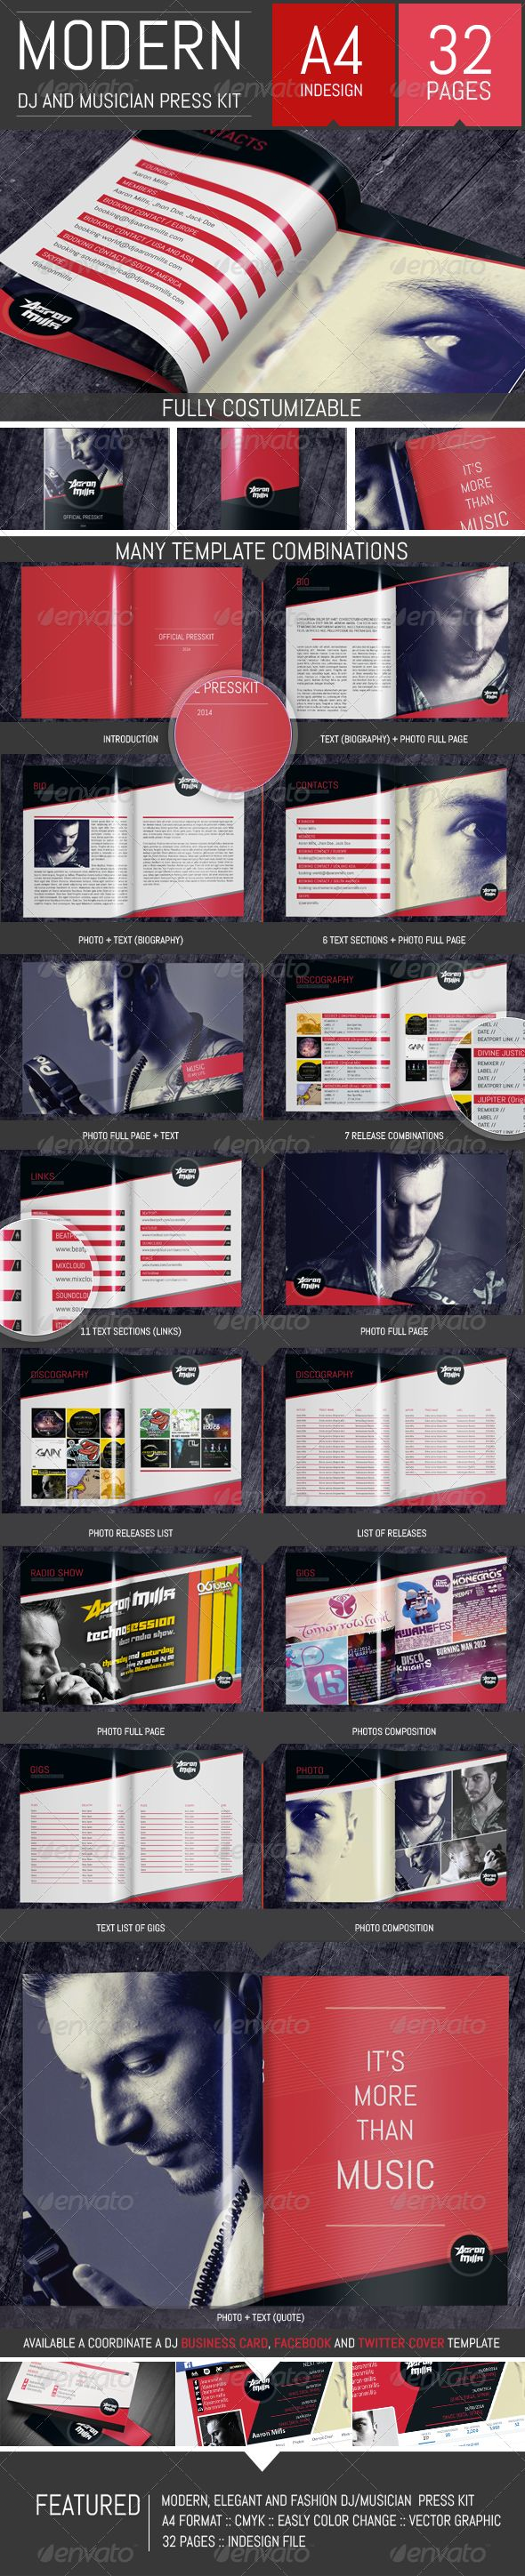 DJ and Musician Press Kit / Resume Template   http://graphicriver.net/item/dj-and-musician-press-kit-resume-template/8325504?ref=damiamio